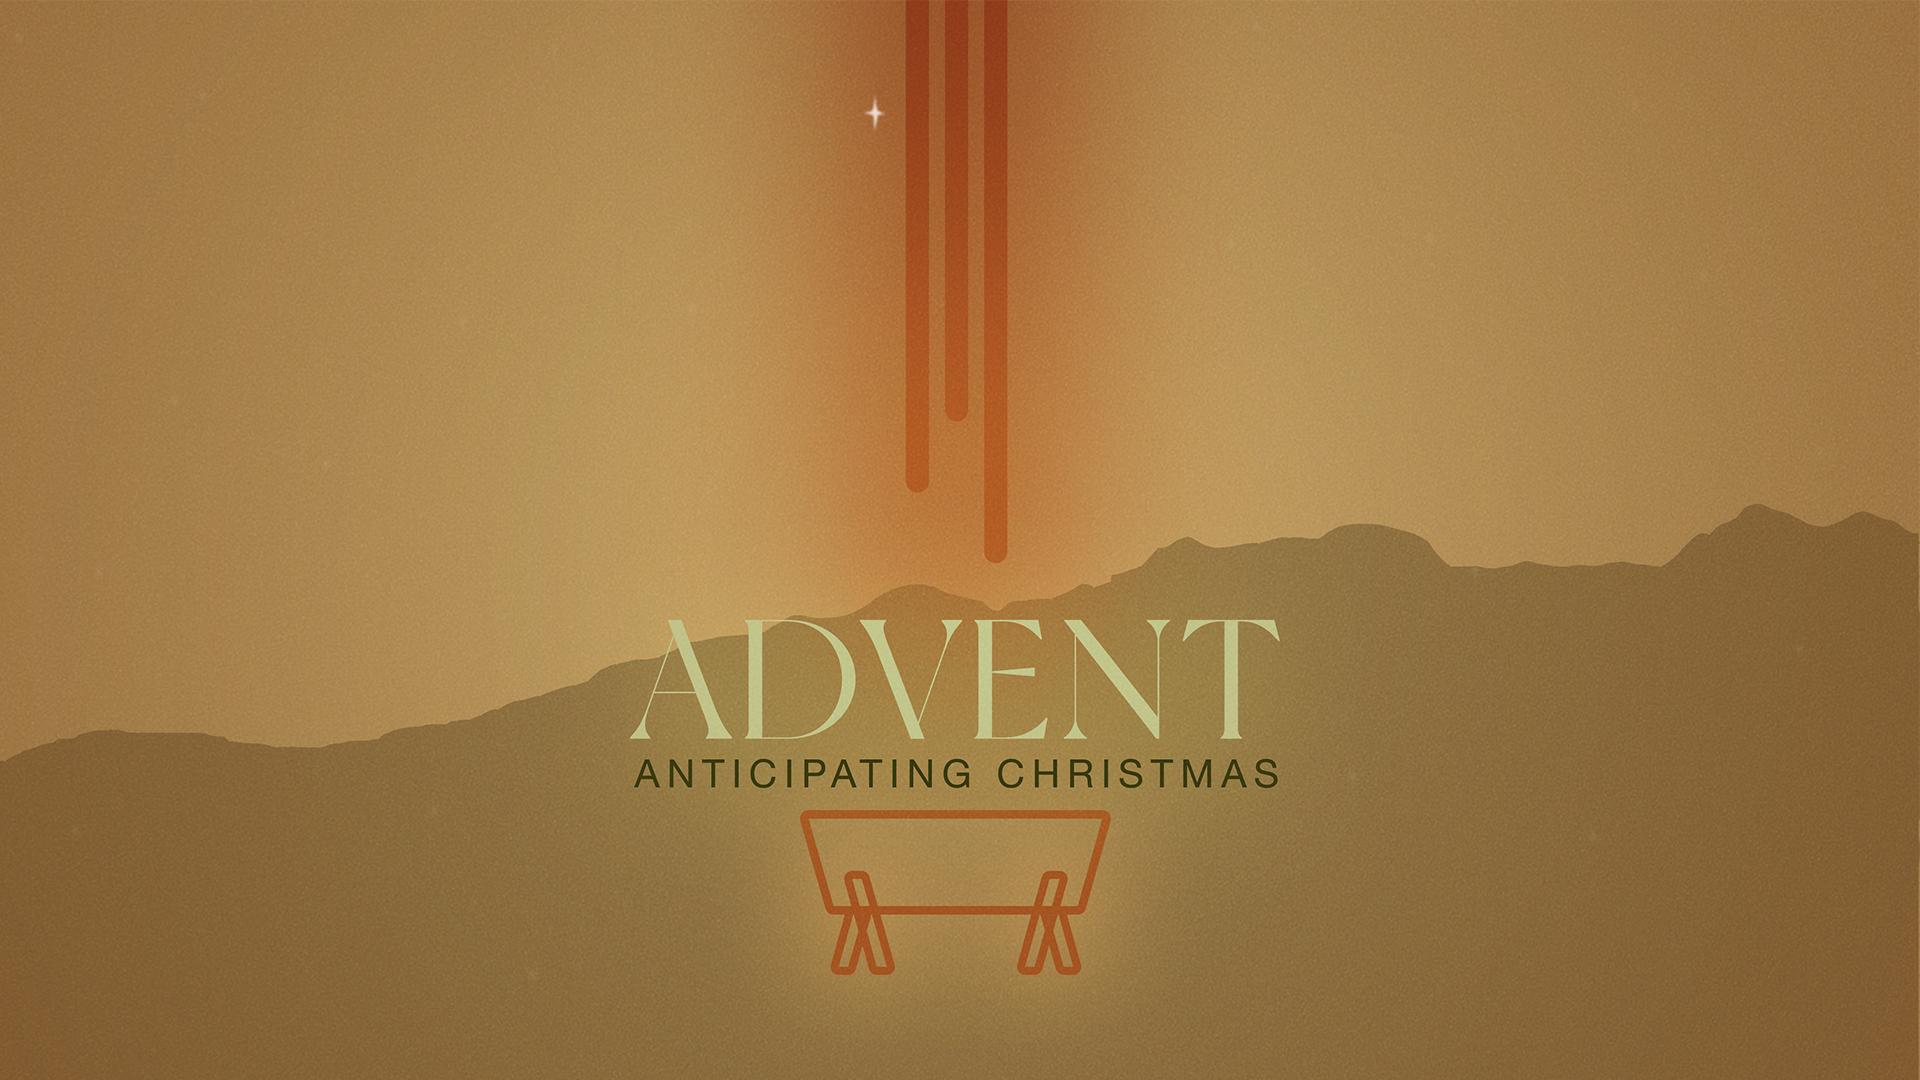 Advent: Anticipating Christmas